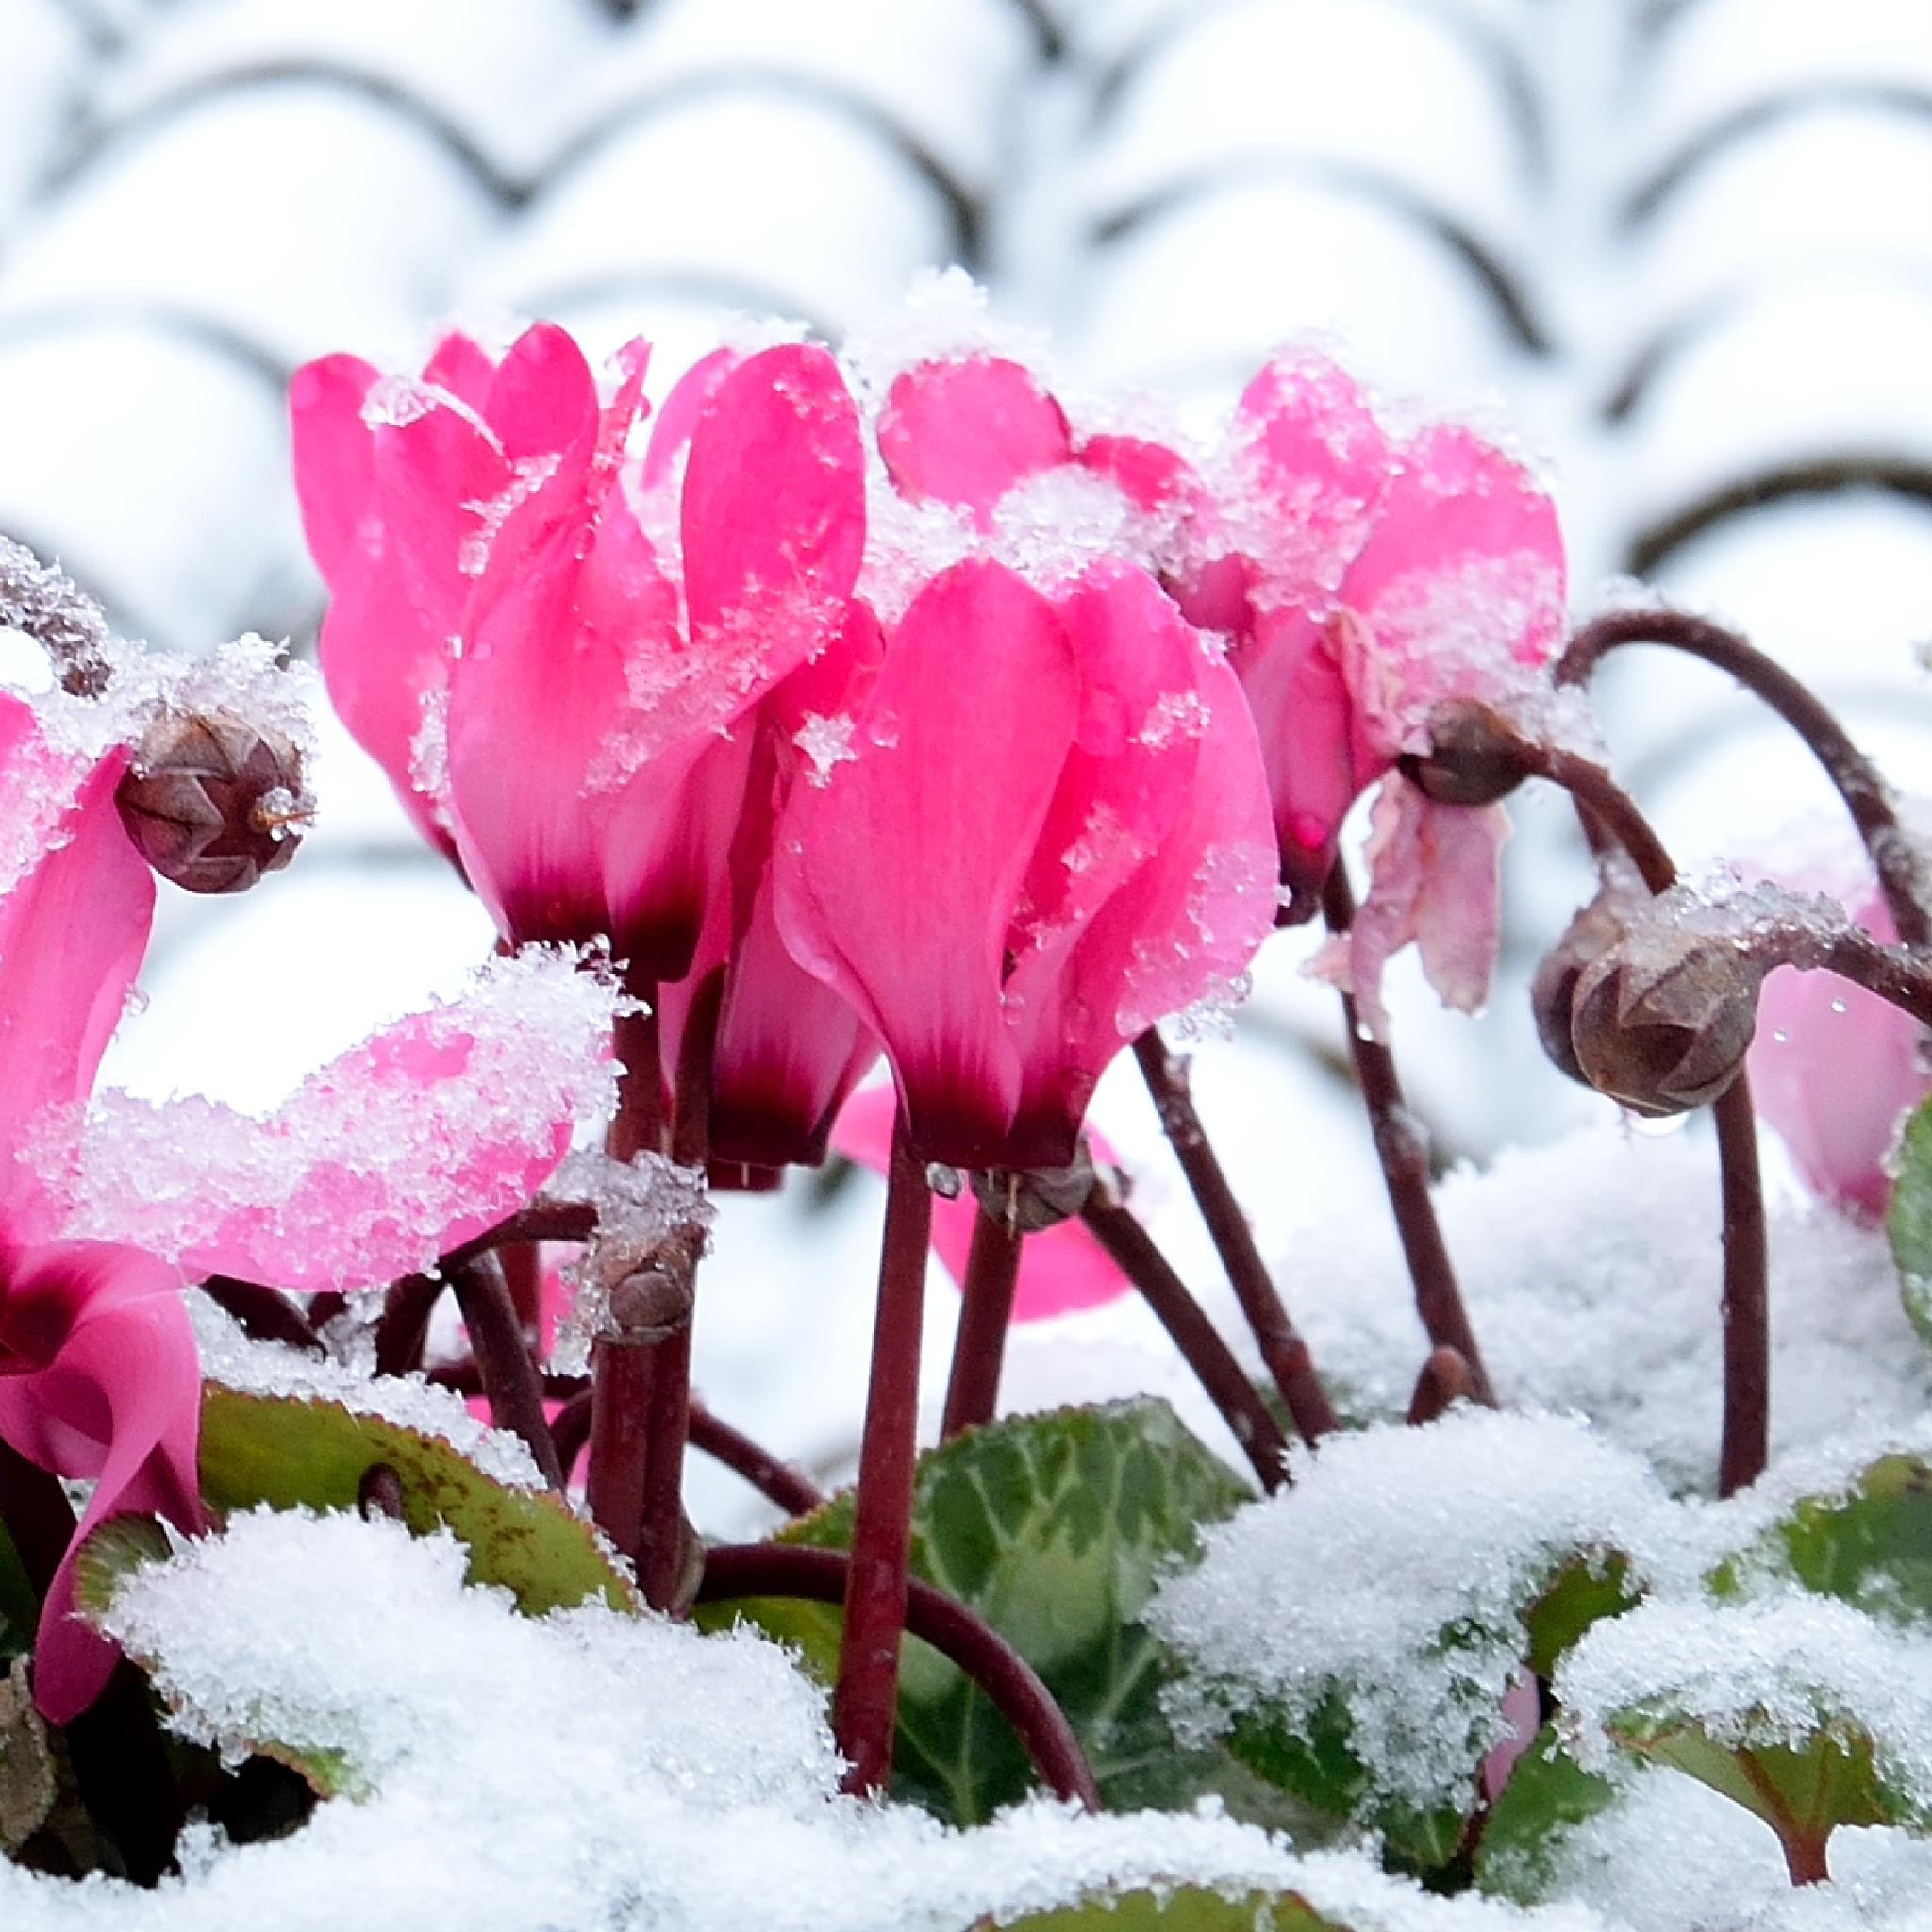 Cyclamen under the snow by Donna Corbett